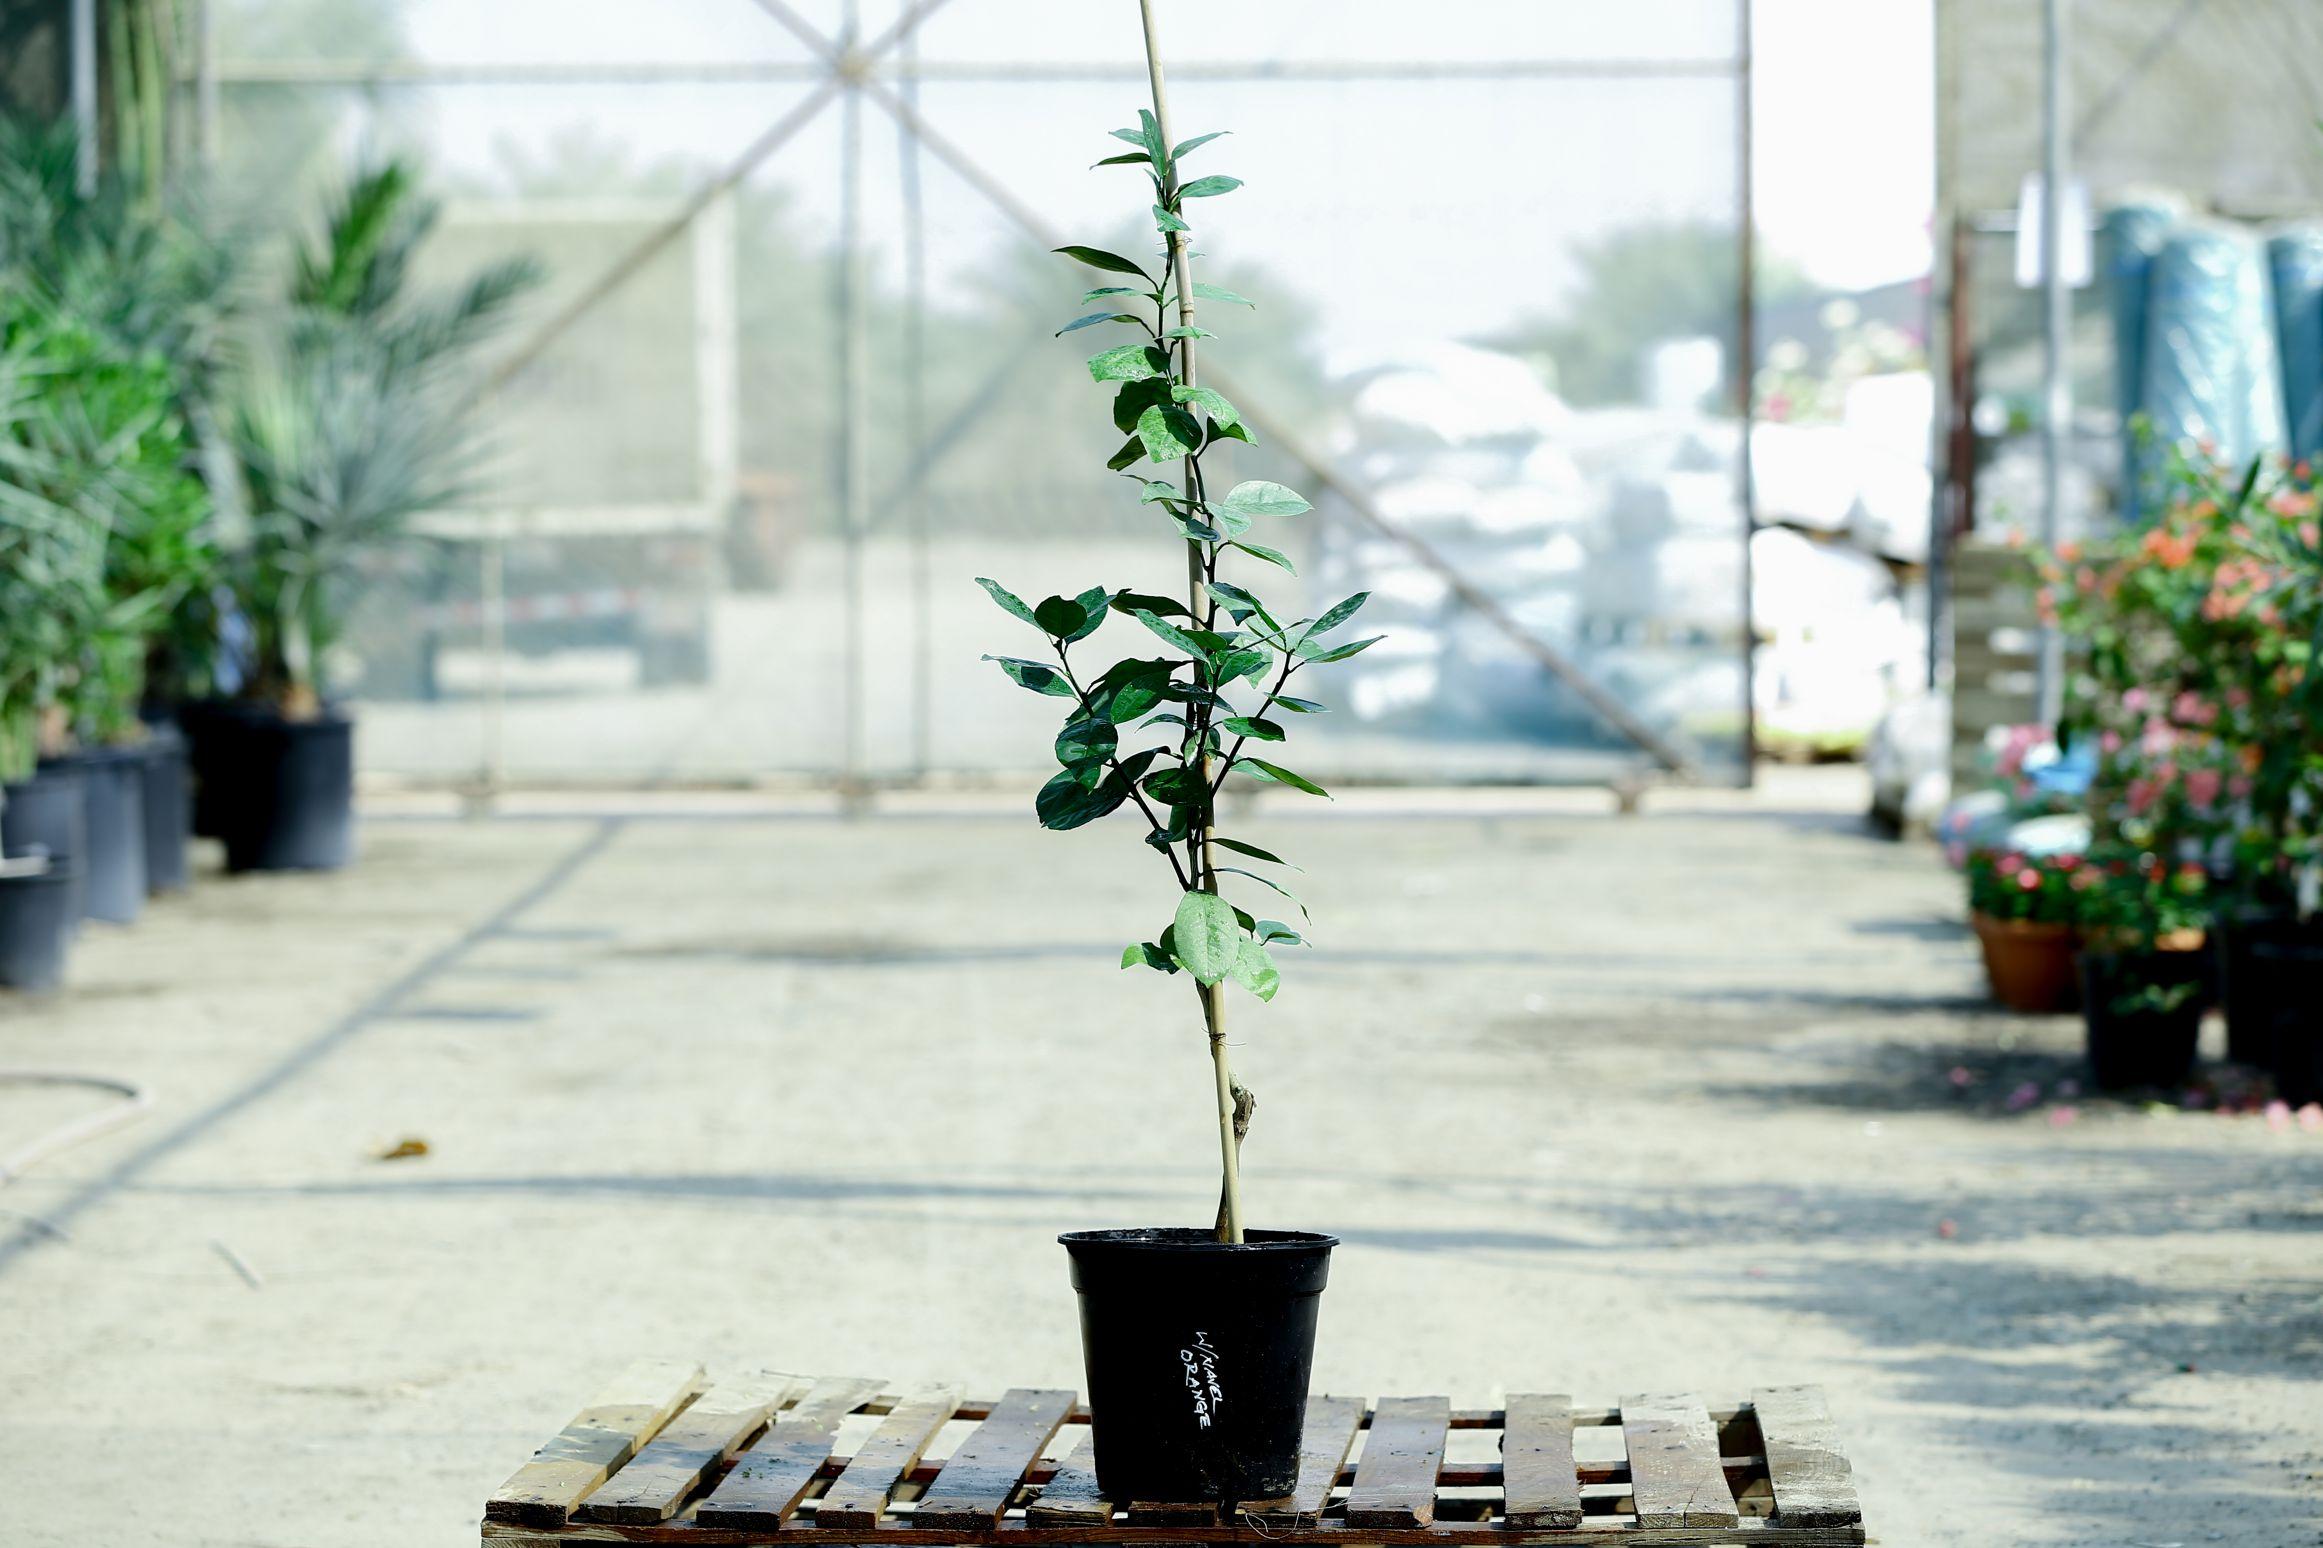 Orange Washingtonia Navel 'Outdoor Plants'